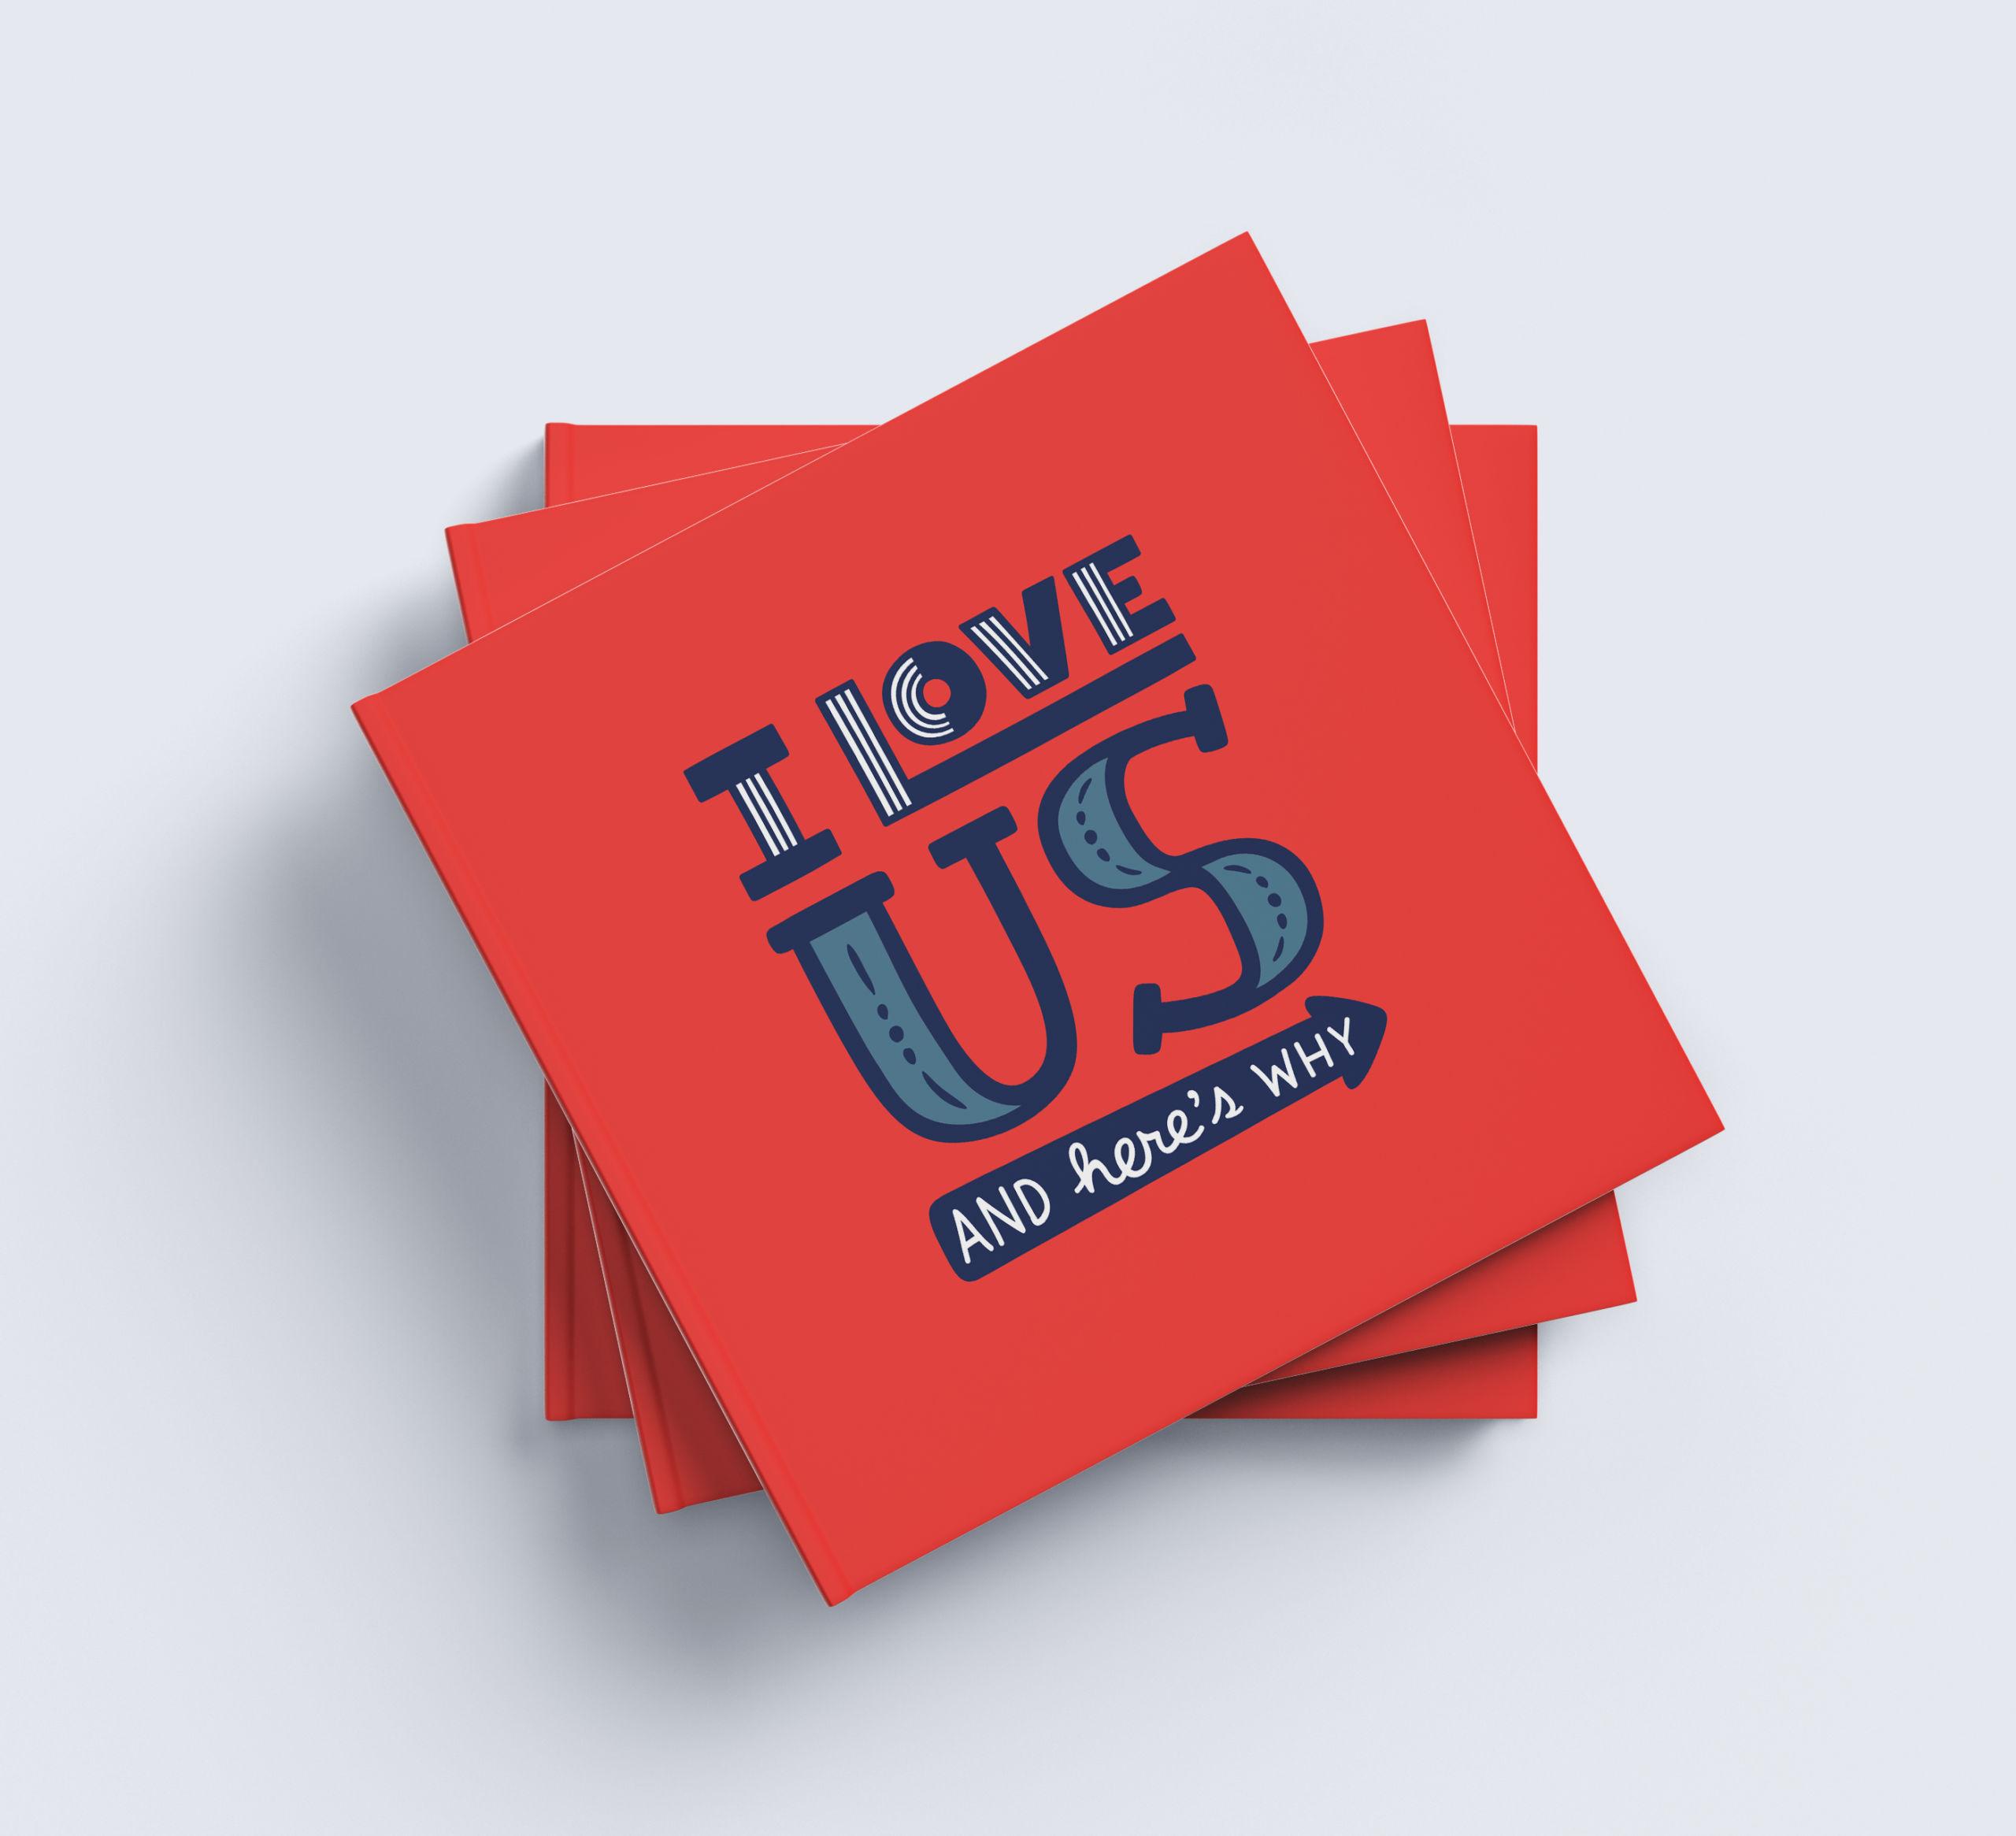 I Love Us Book